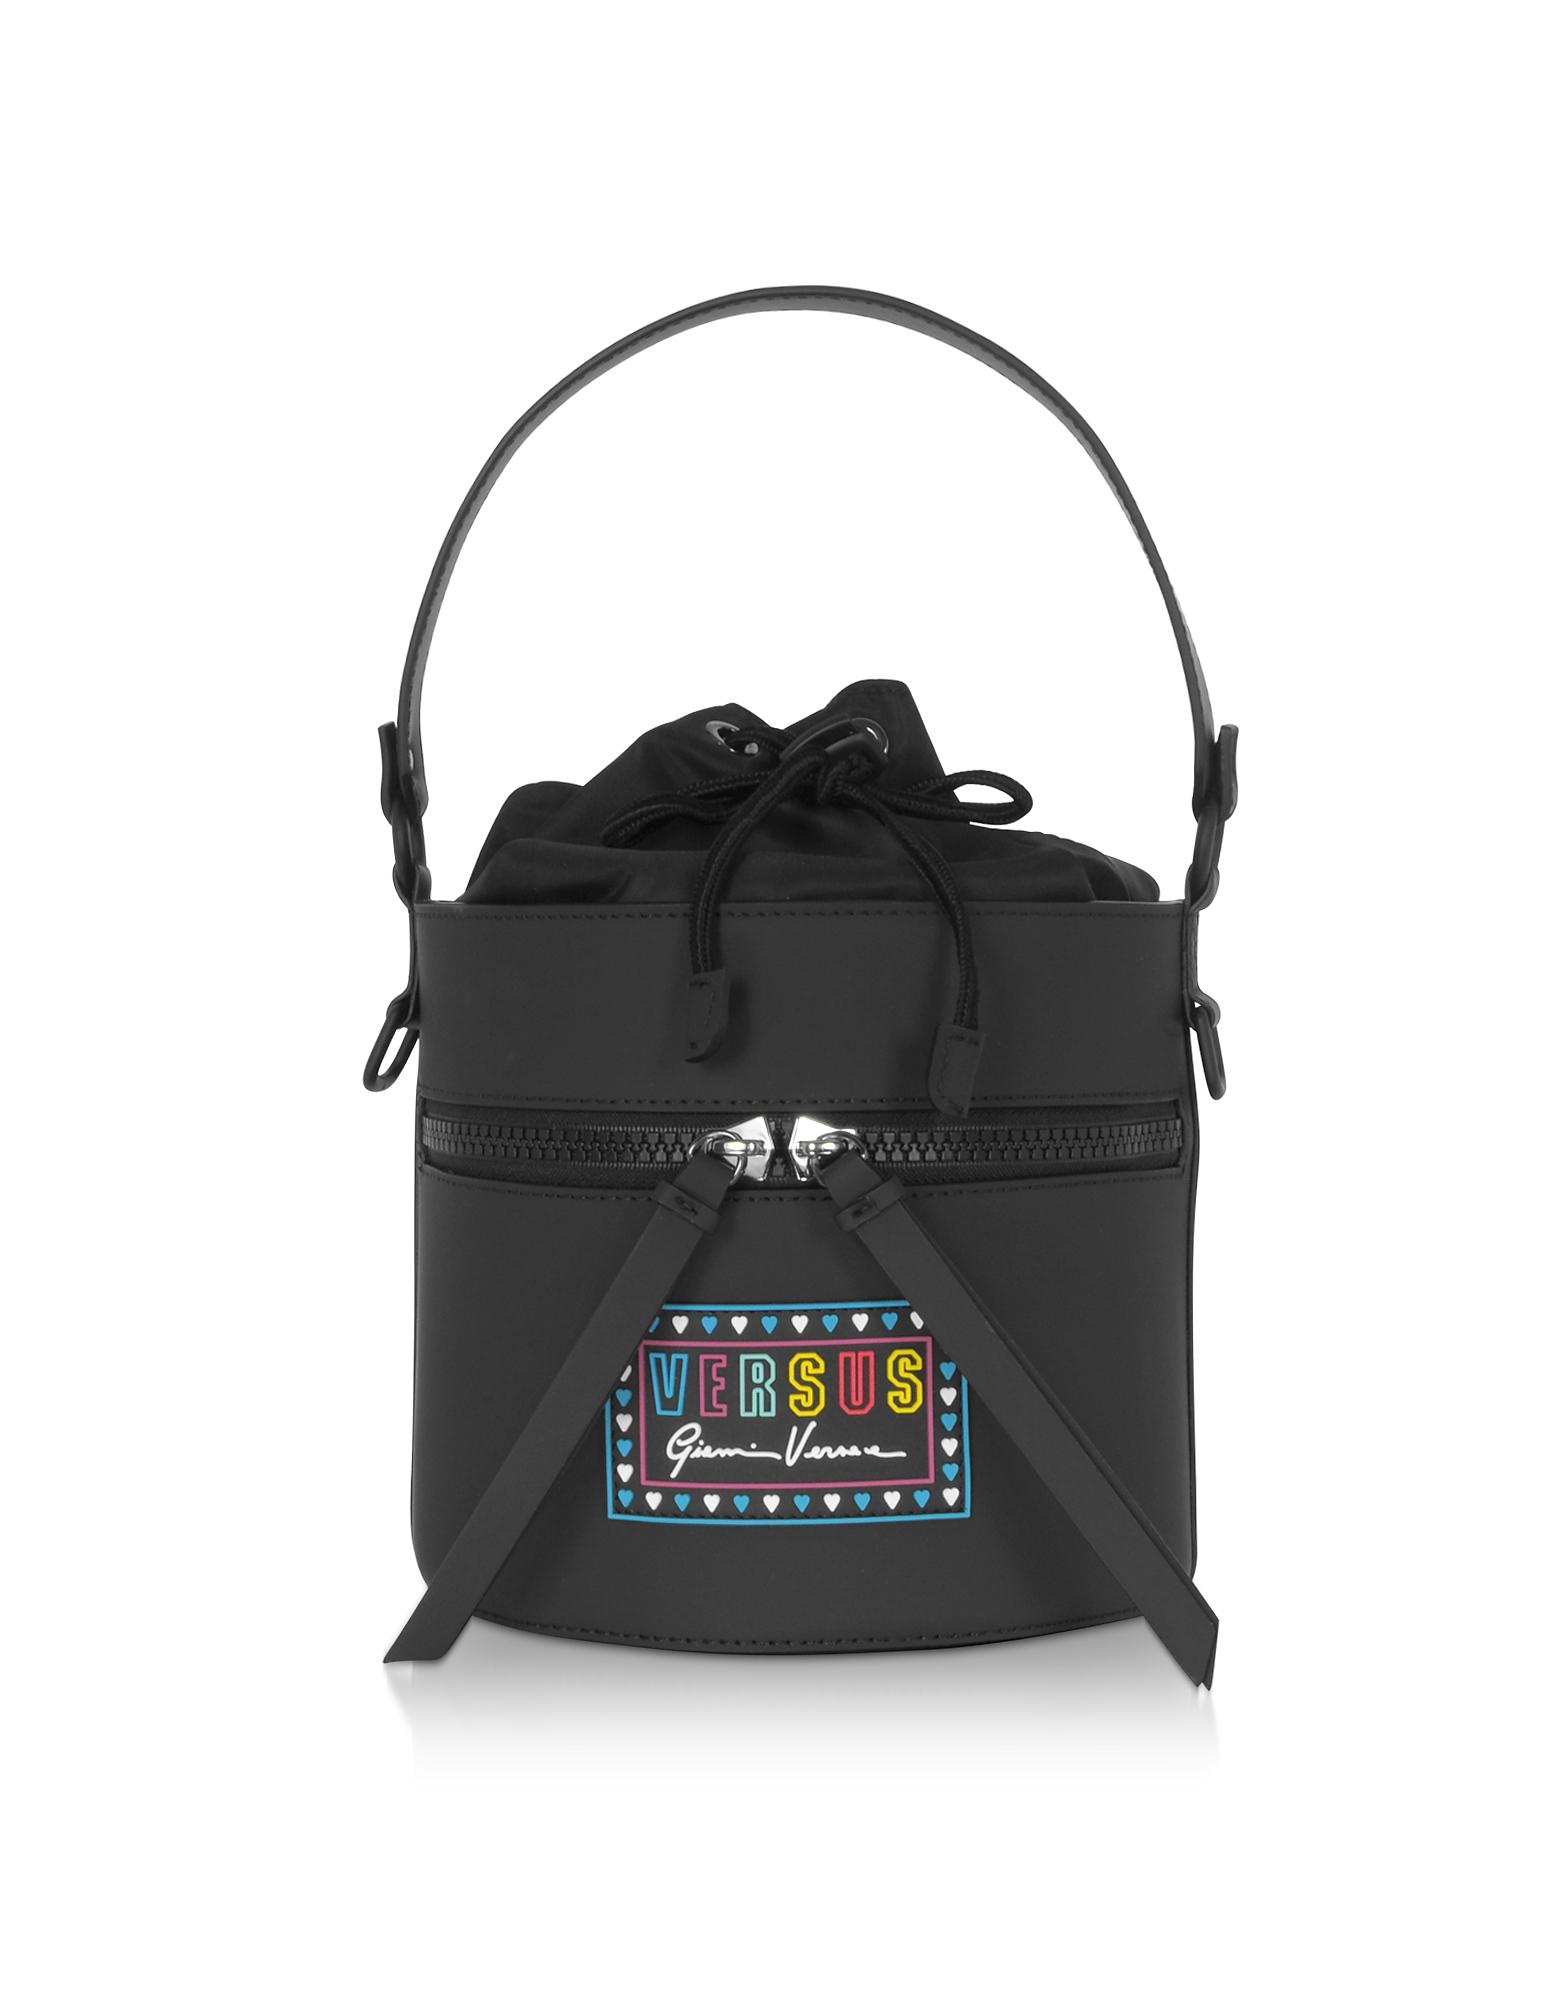 Versace Versus Designer Handbags, Gommato Leather and Nylon Shoulder Bag